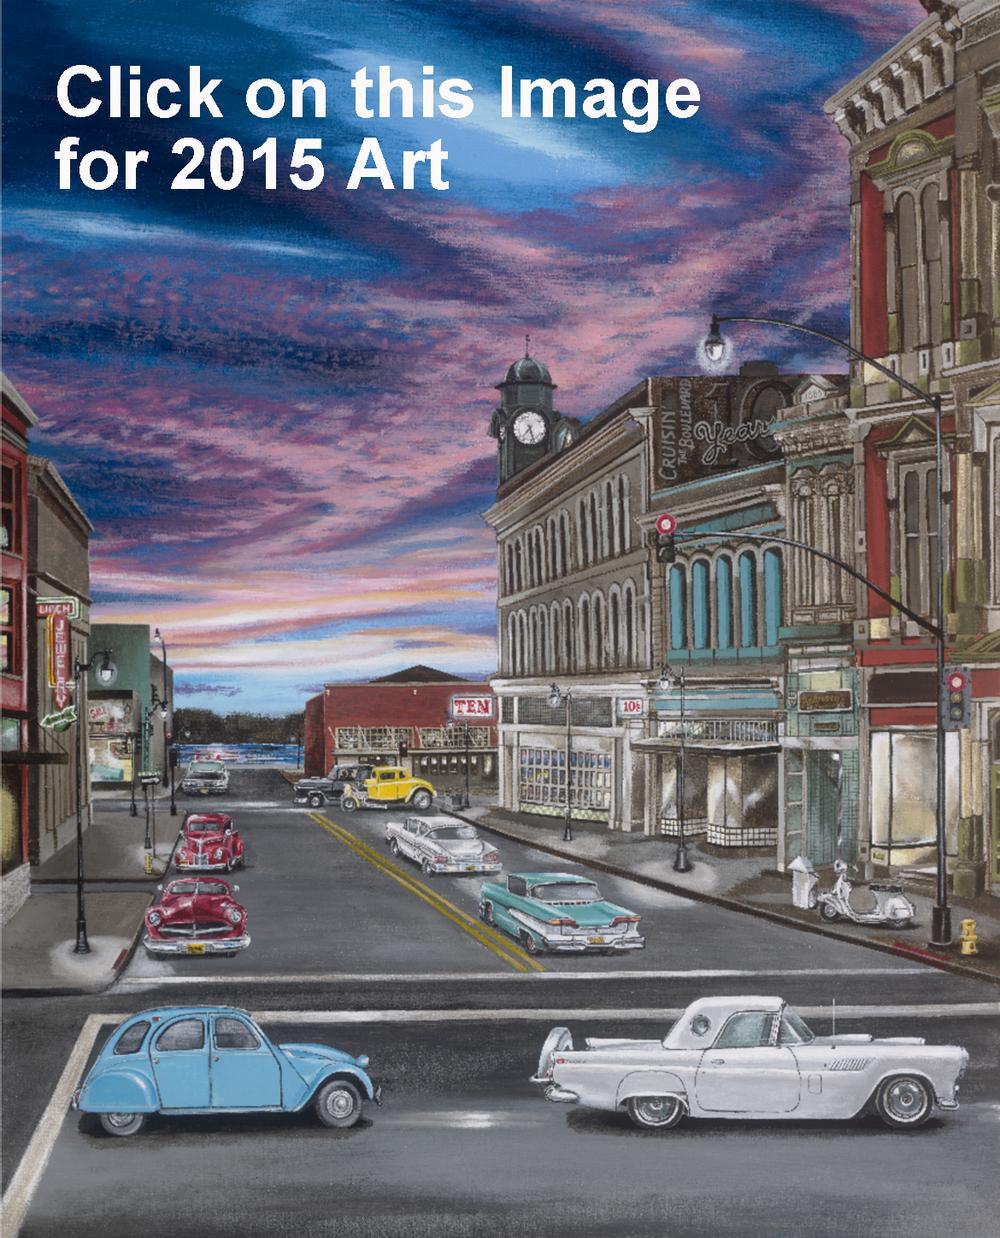 CTB-2016-ART.jpg